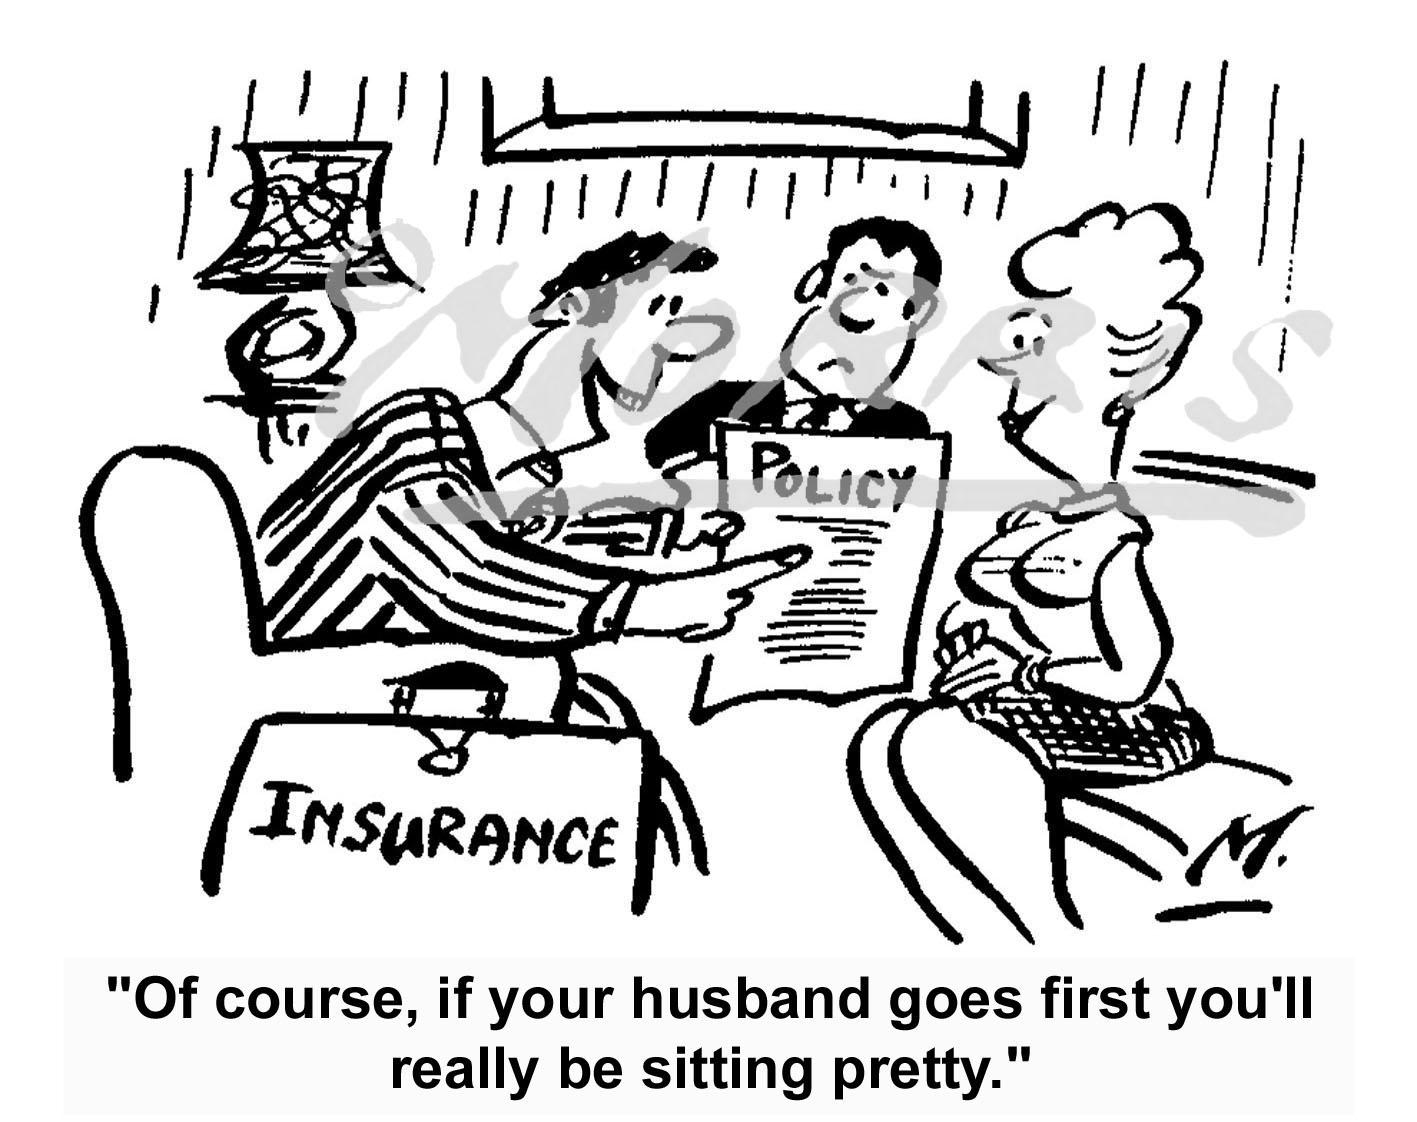 Insurance endowment policy cartoon Ref: 0324bw